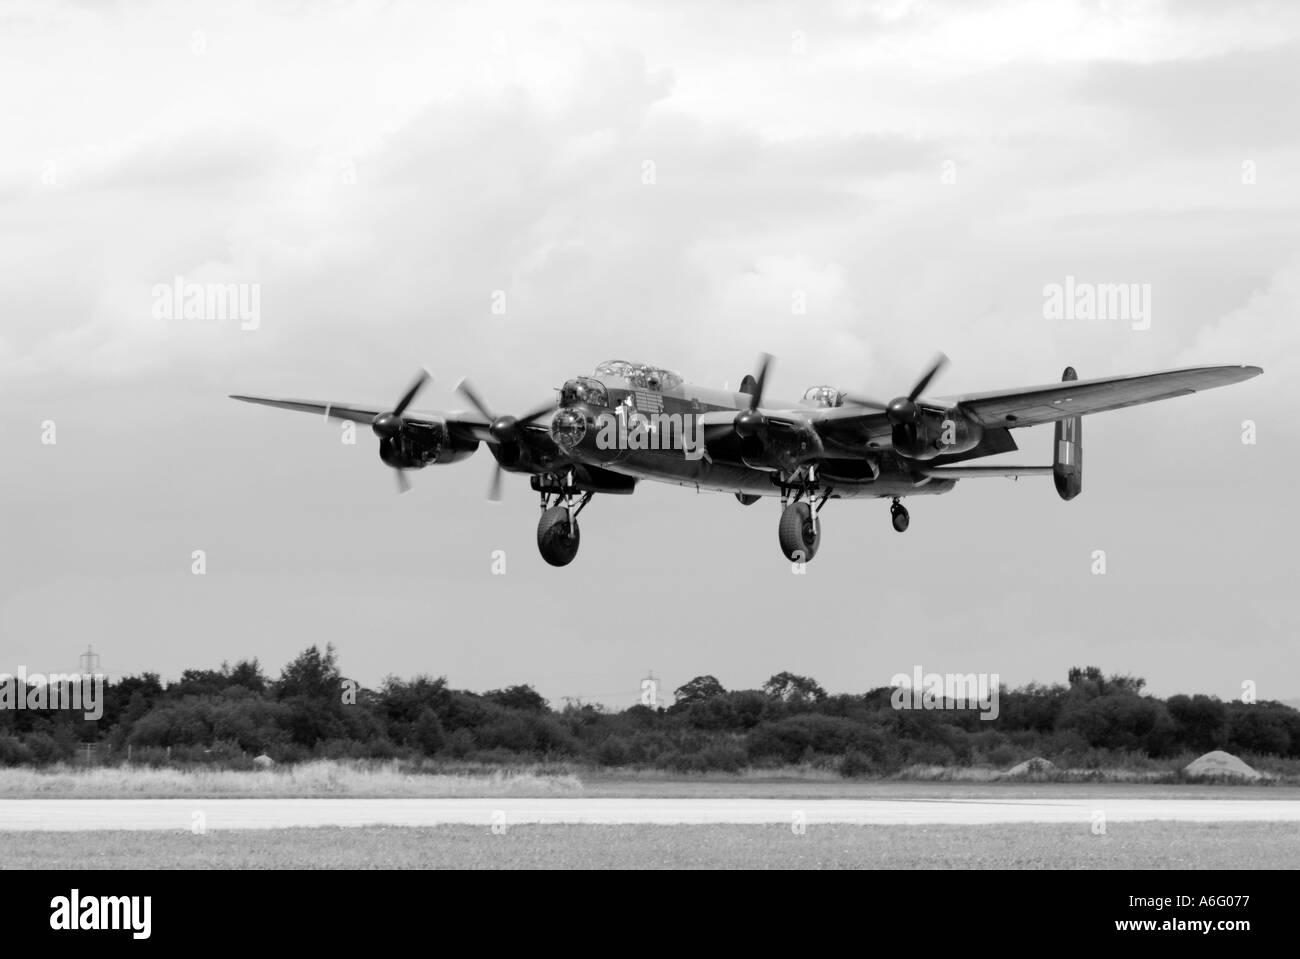 lancaster bomber RAF royal air force world war two 2 bomb rolls royce aero engine air crew solder fight germany destroy landing - Stock Image